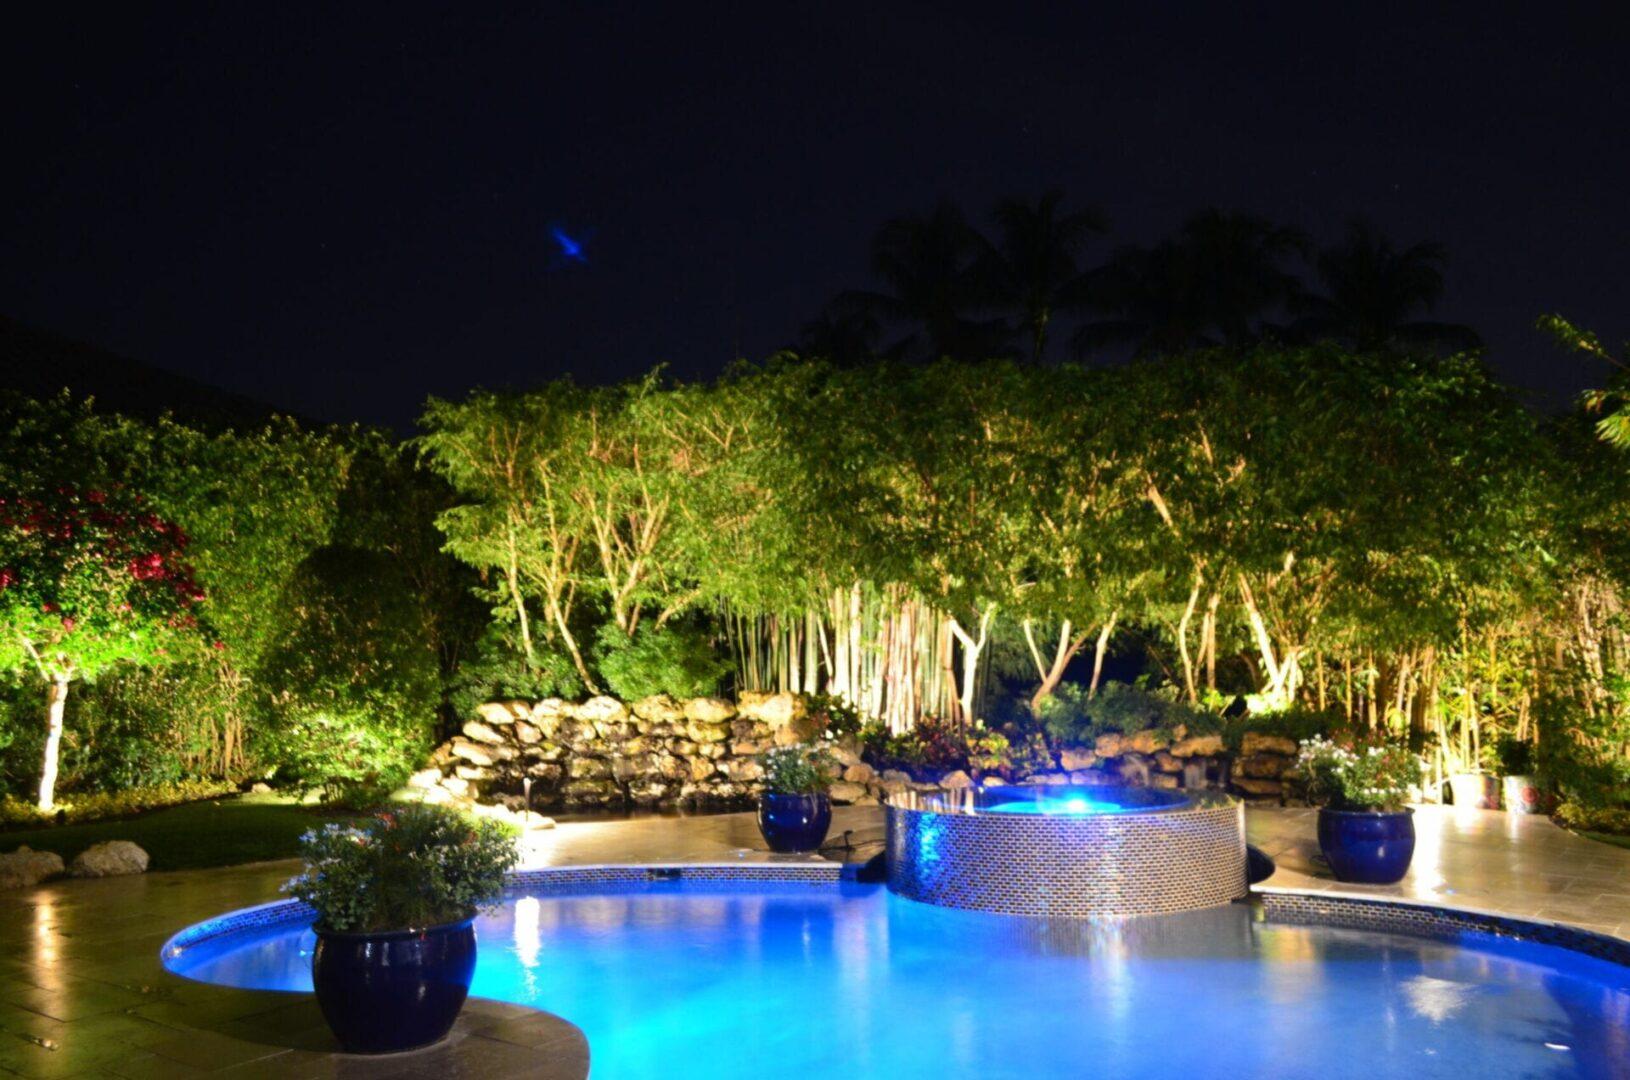 Illumination FL - Landscape Lighting - A Beautiful Oasis